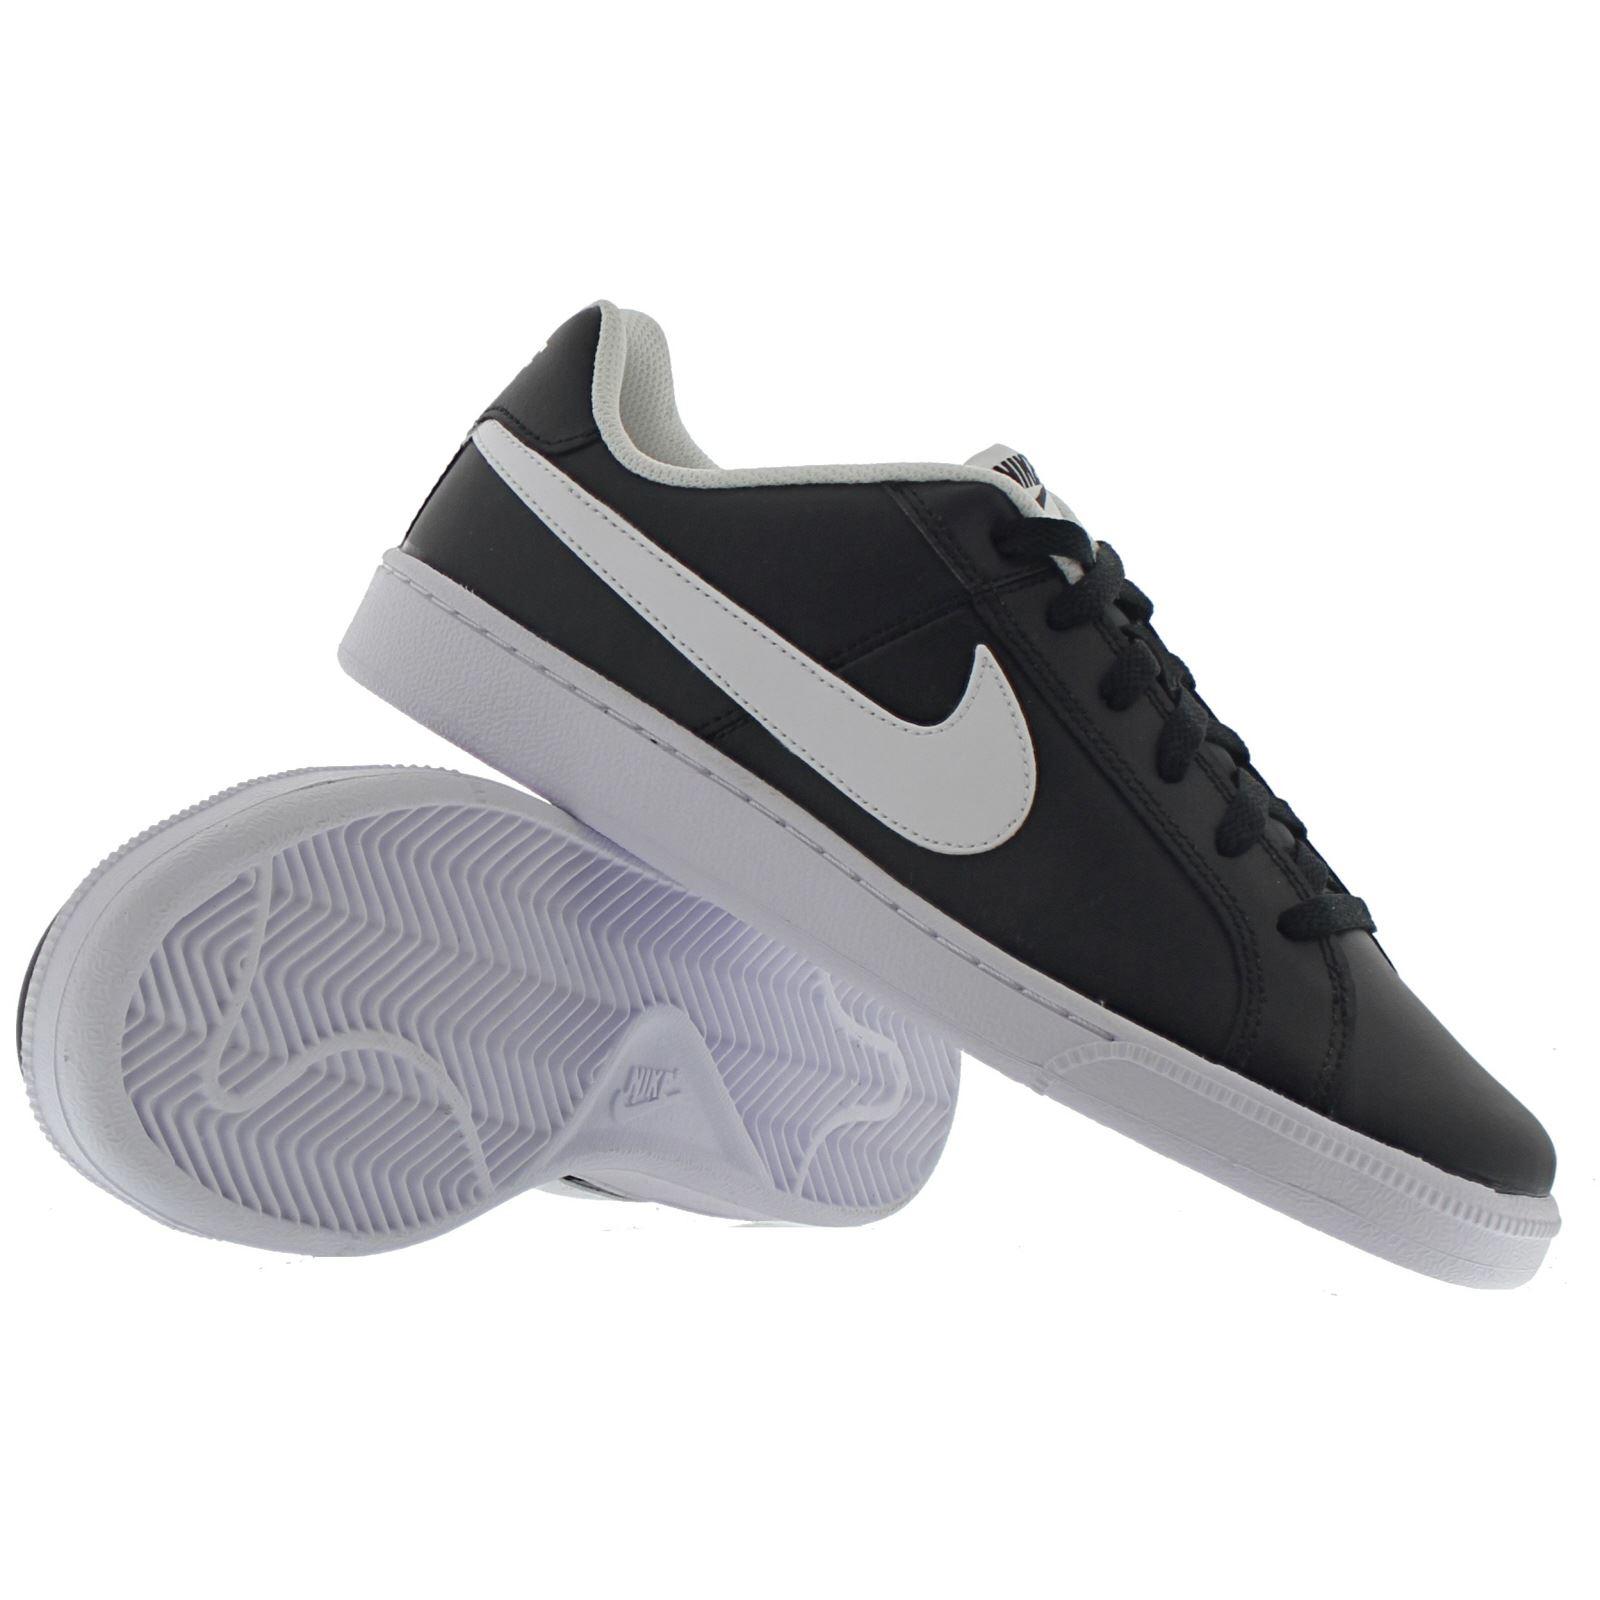 Nike-Scarpe-Sportive-Sneakers-Tennis-court-royale-Sportswear-Lifestyle miniatura 6